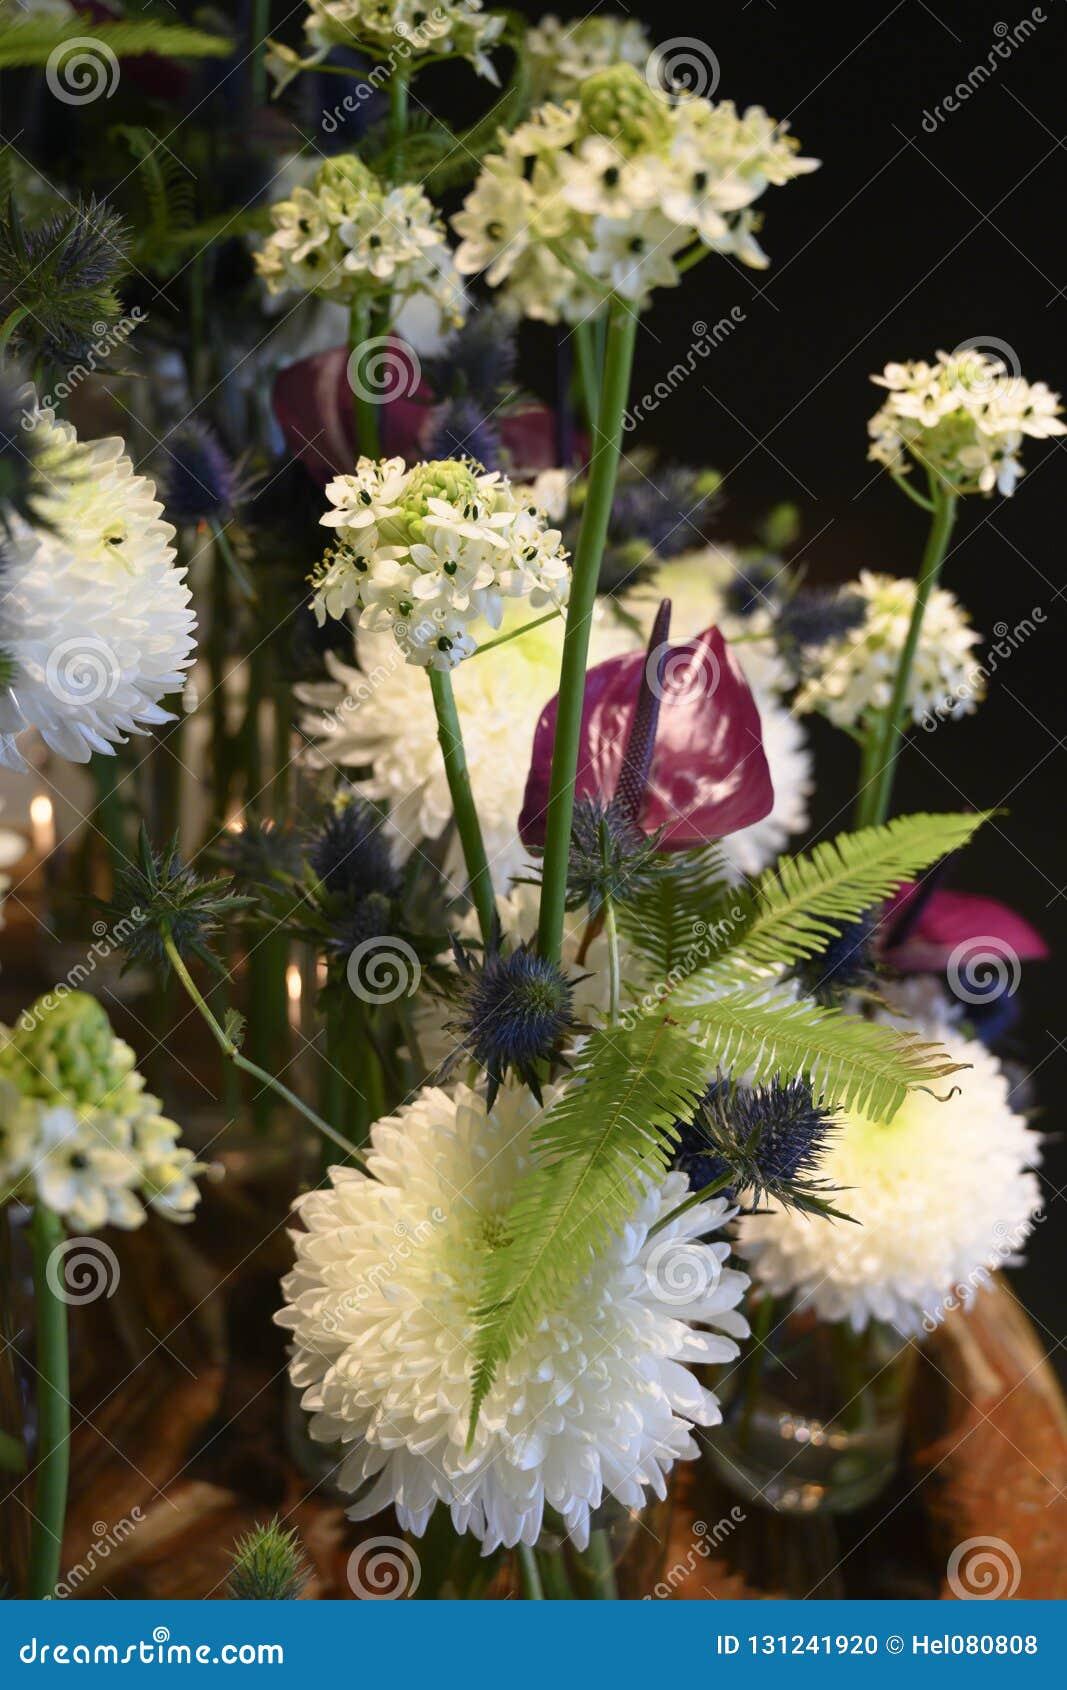 Extraordinary White Winter Flower Dream With Chrysanthemum Anturia Fern Thistle Beautiful Flower Arrangement Stock Photo Image Of Bunch Anturia 131241920